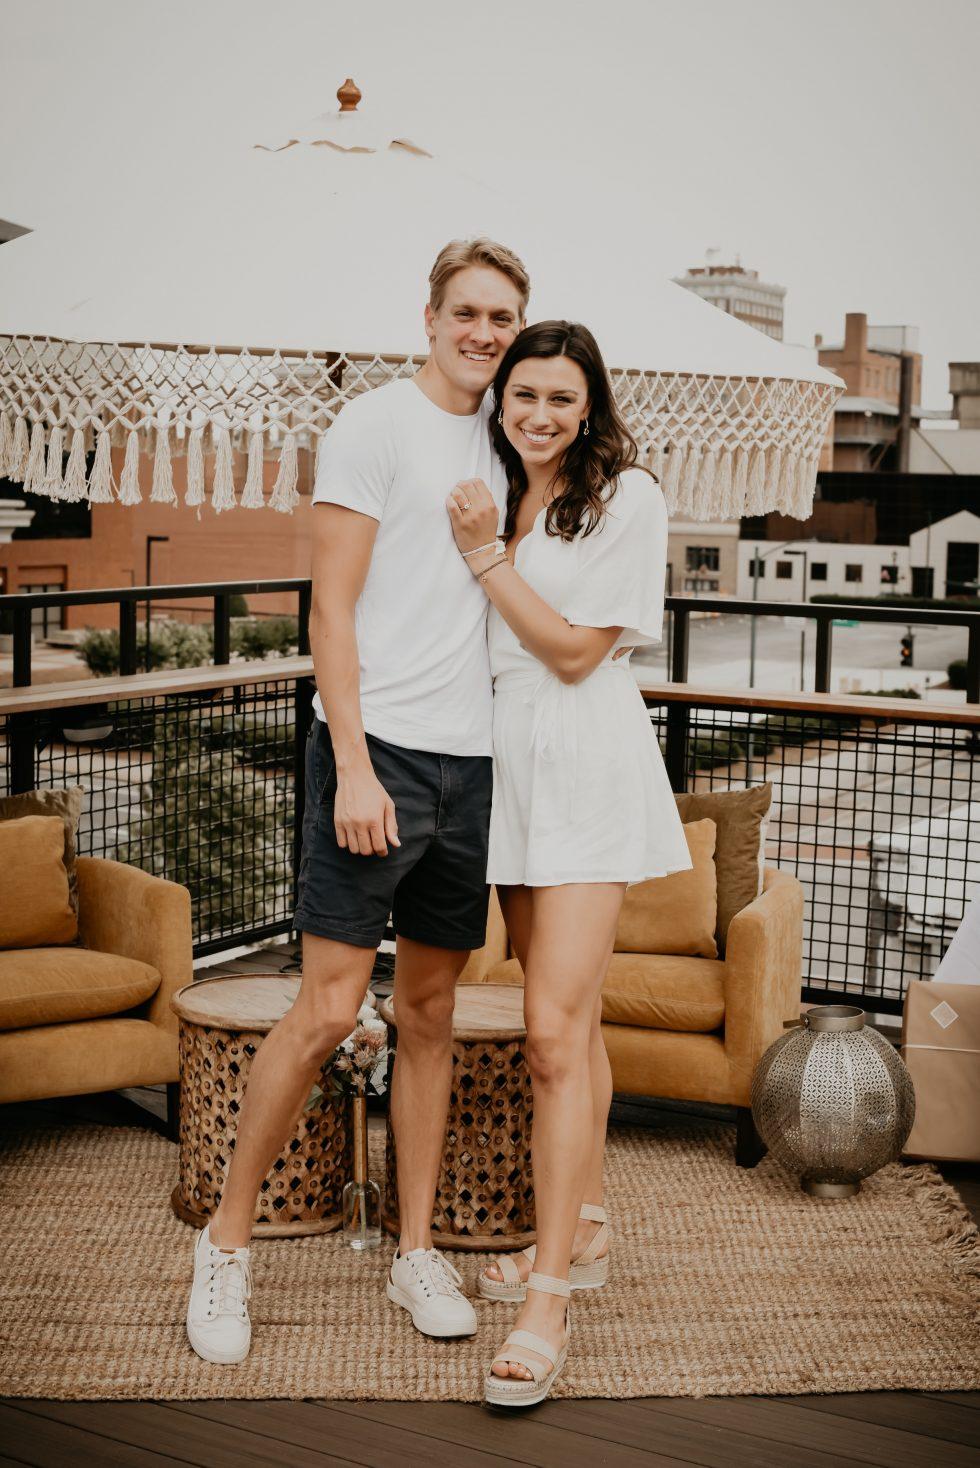 Kress-Terrace-Rooftop-Engagement-Party034